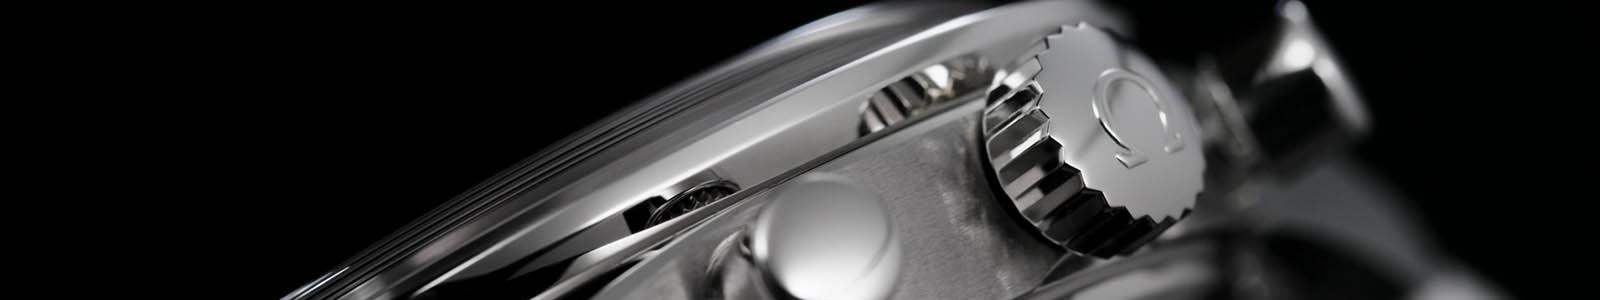 Speedmaster 超霸'57腕表 - 系列